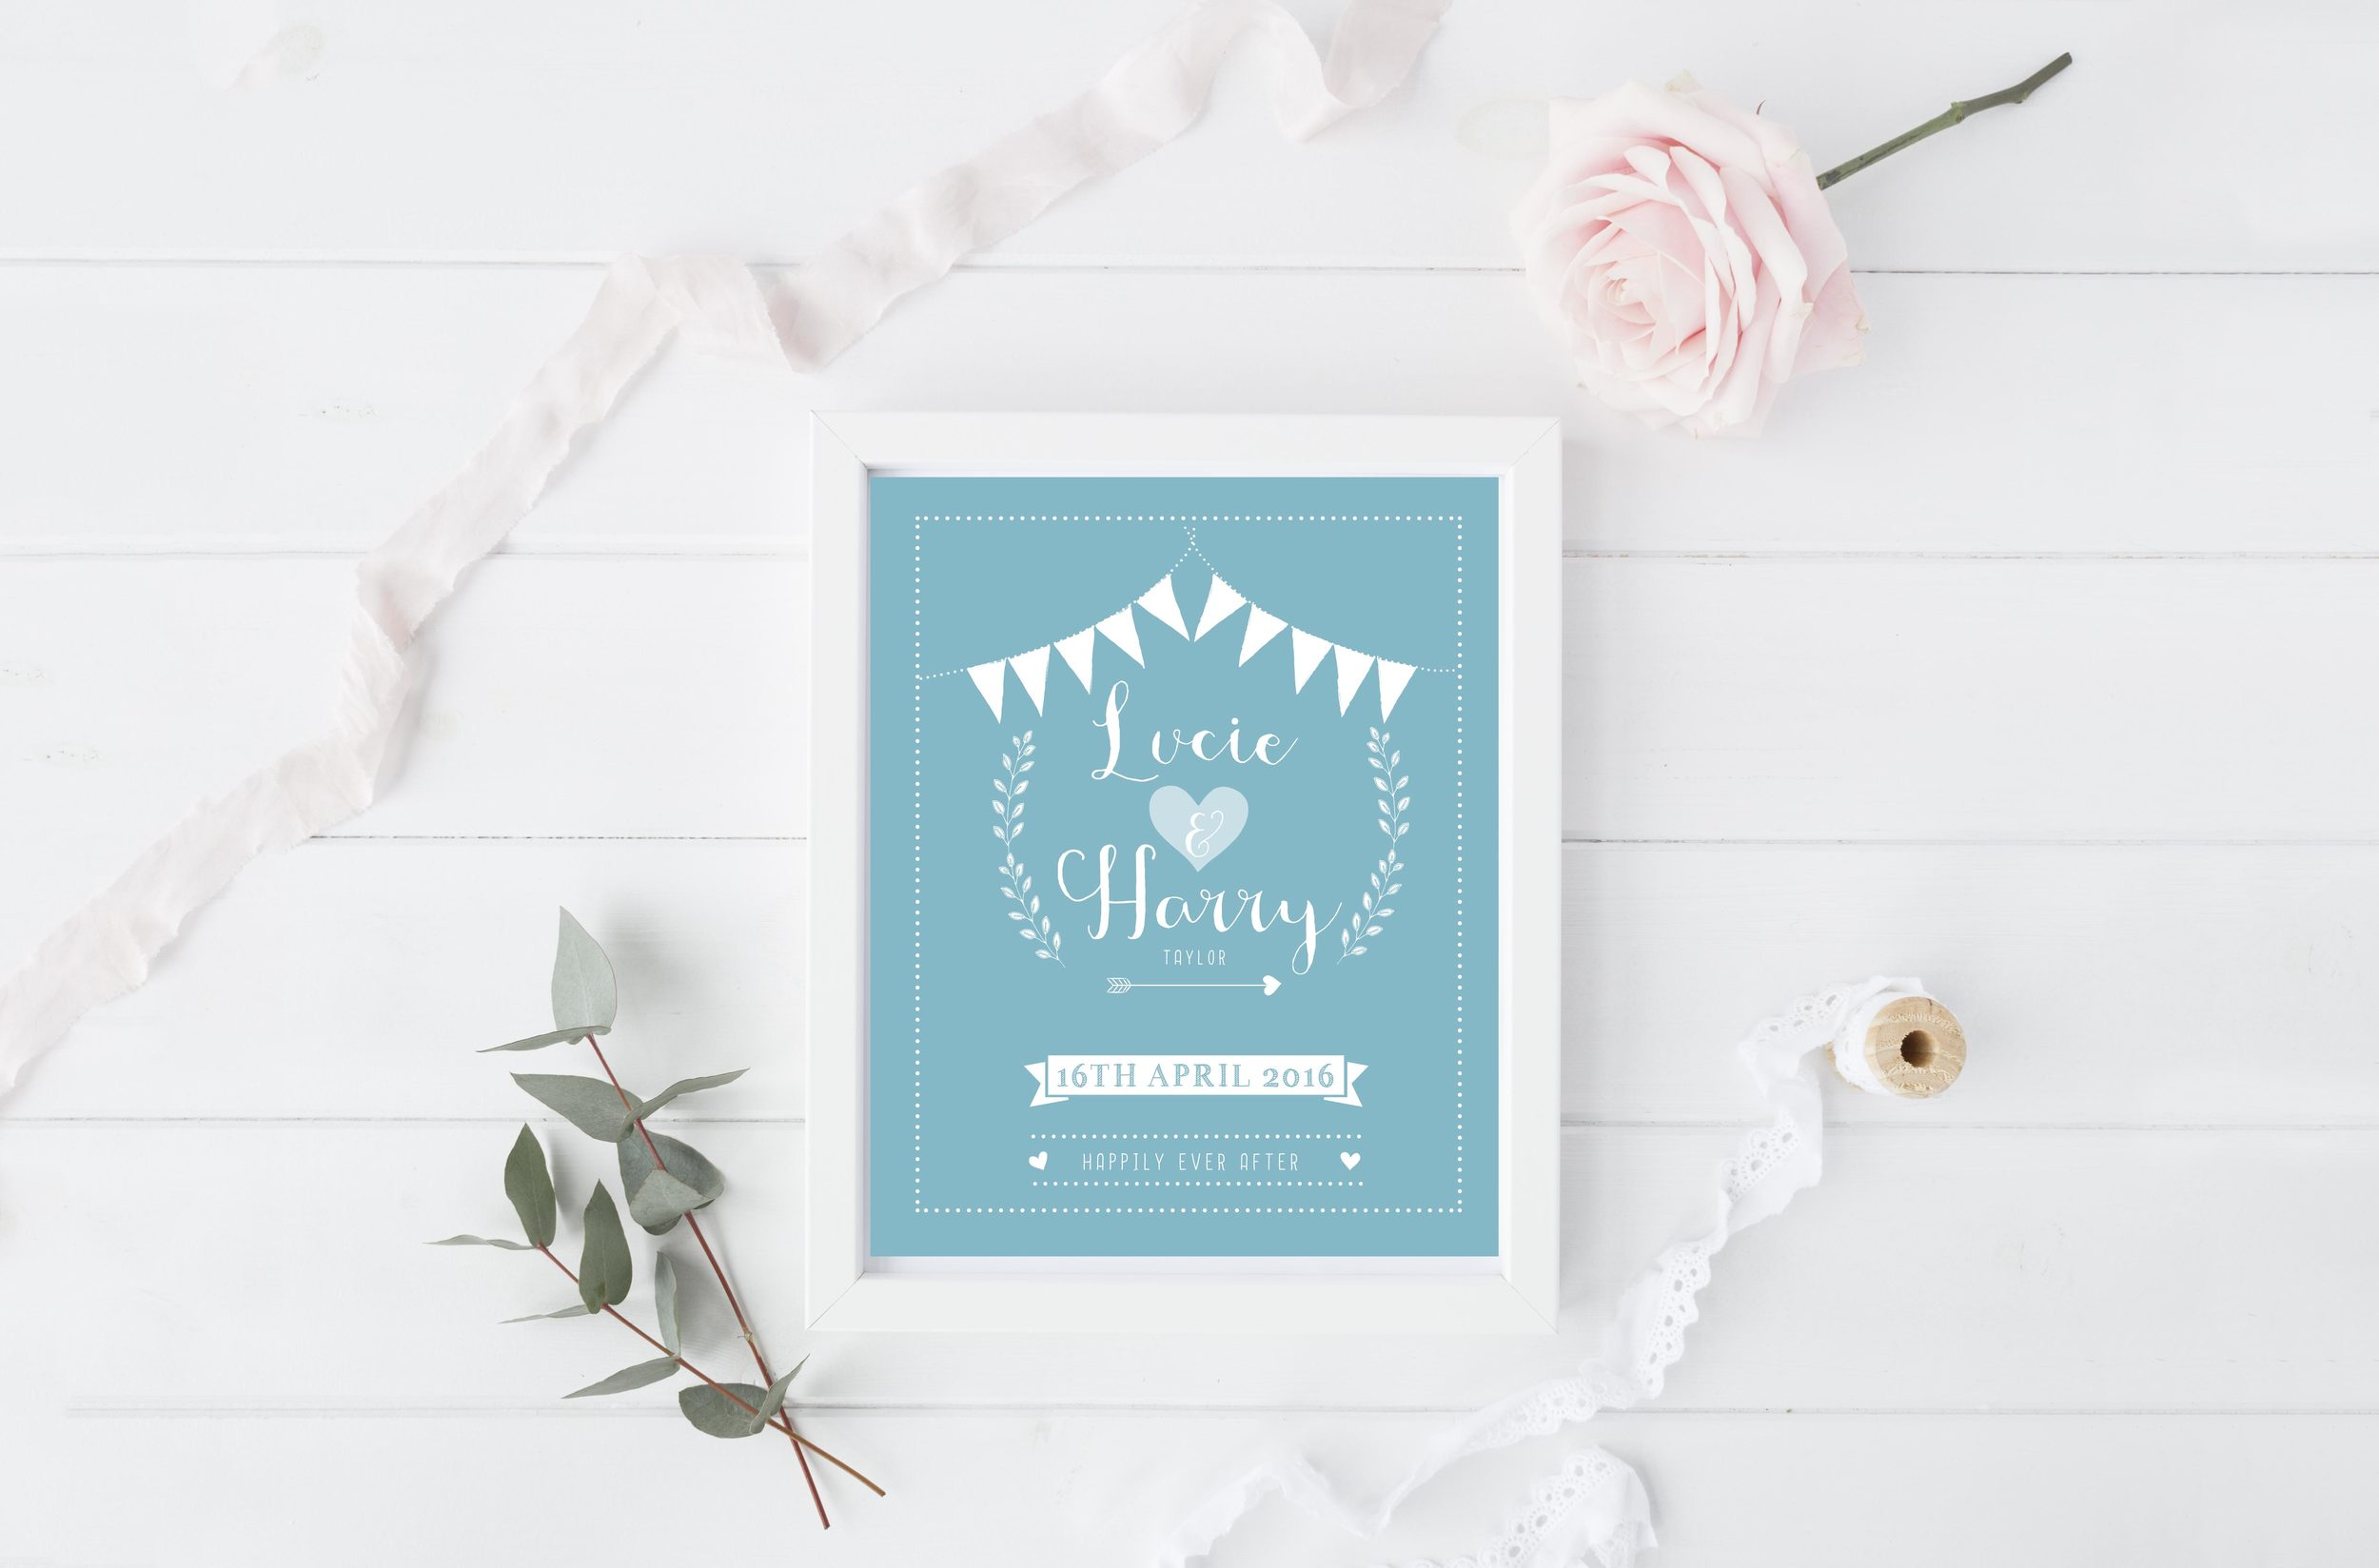 styled 8x10 teal wedding print.jpg